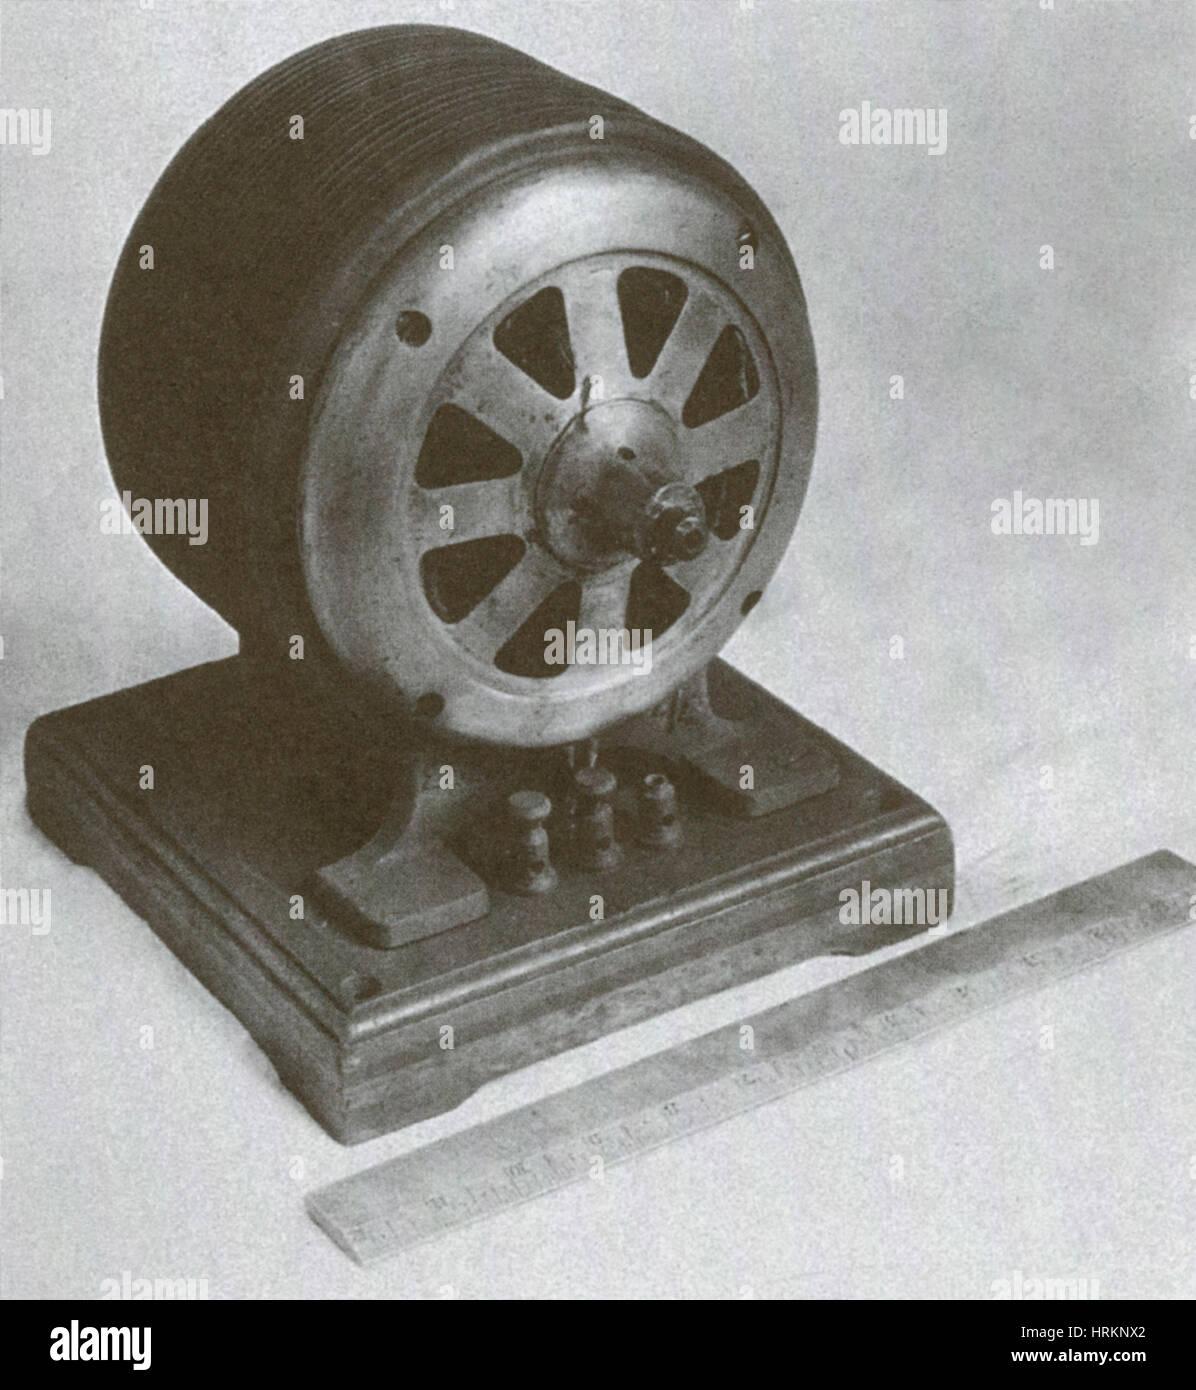 Tesla Induction Motor - Stock Image